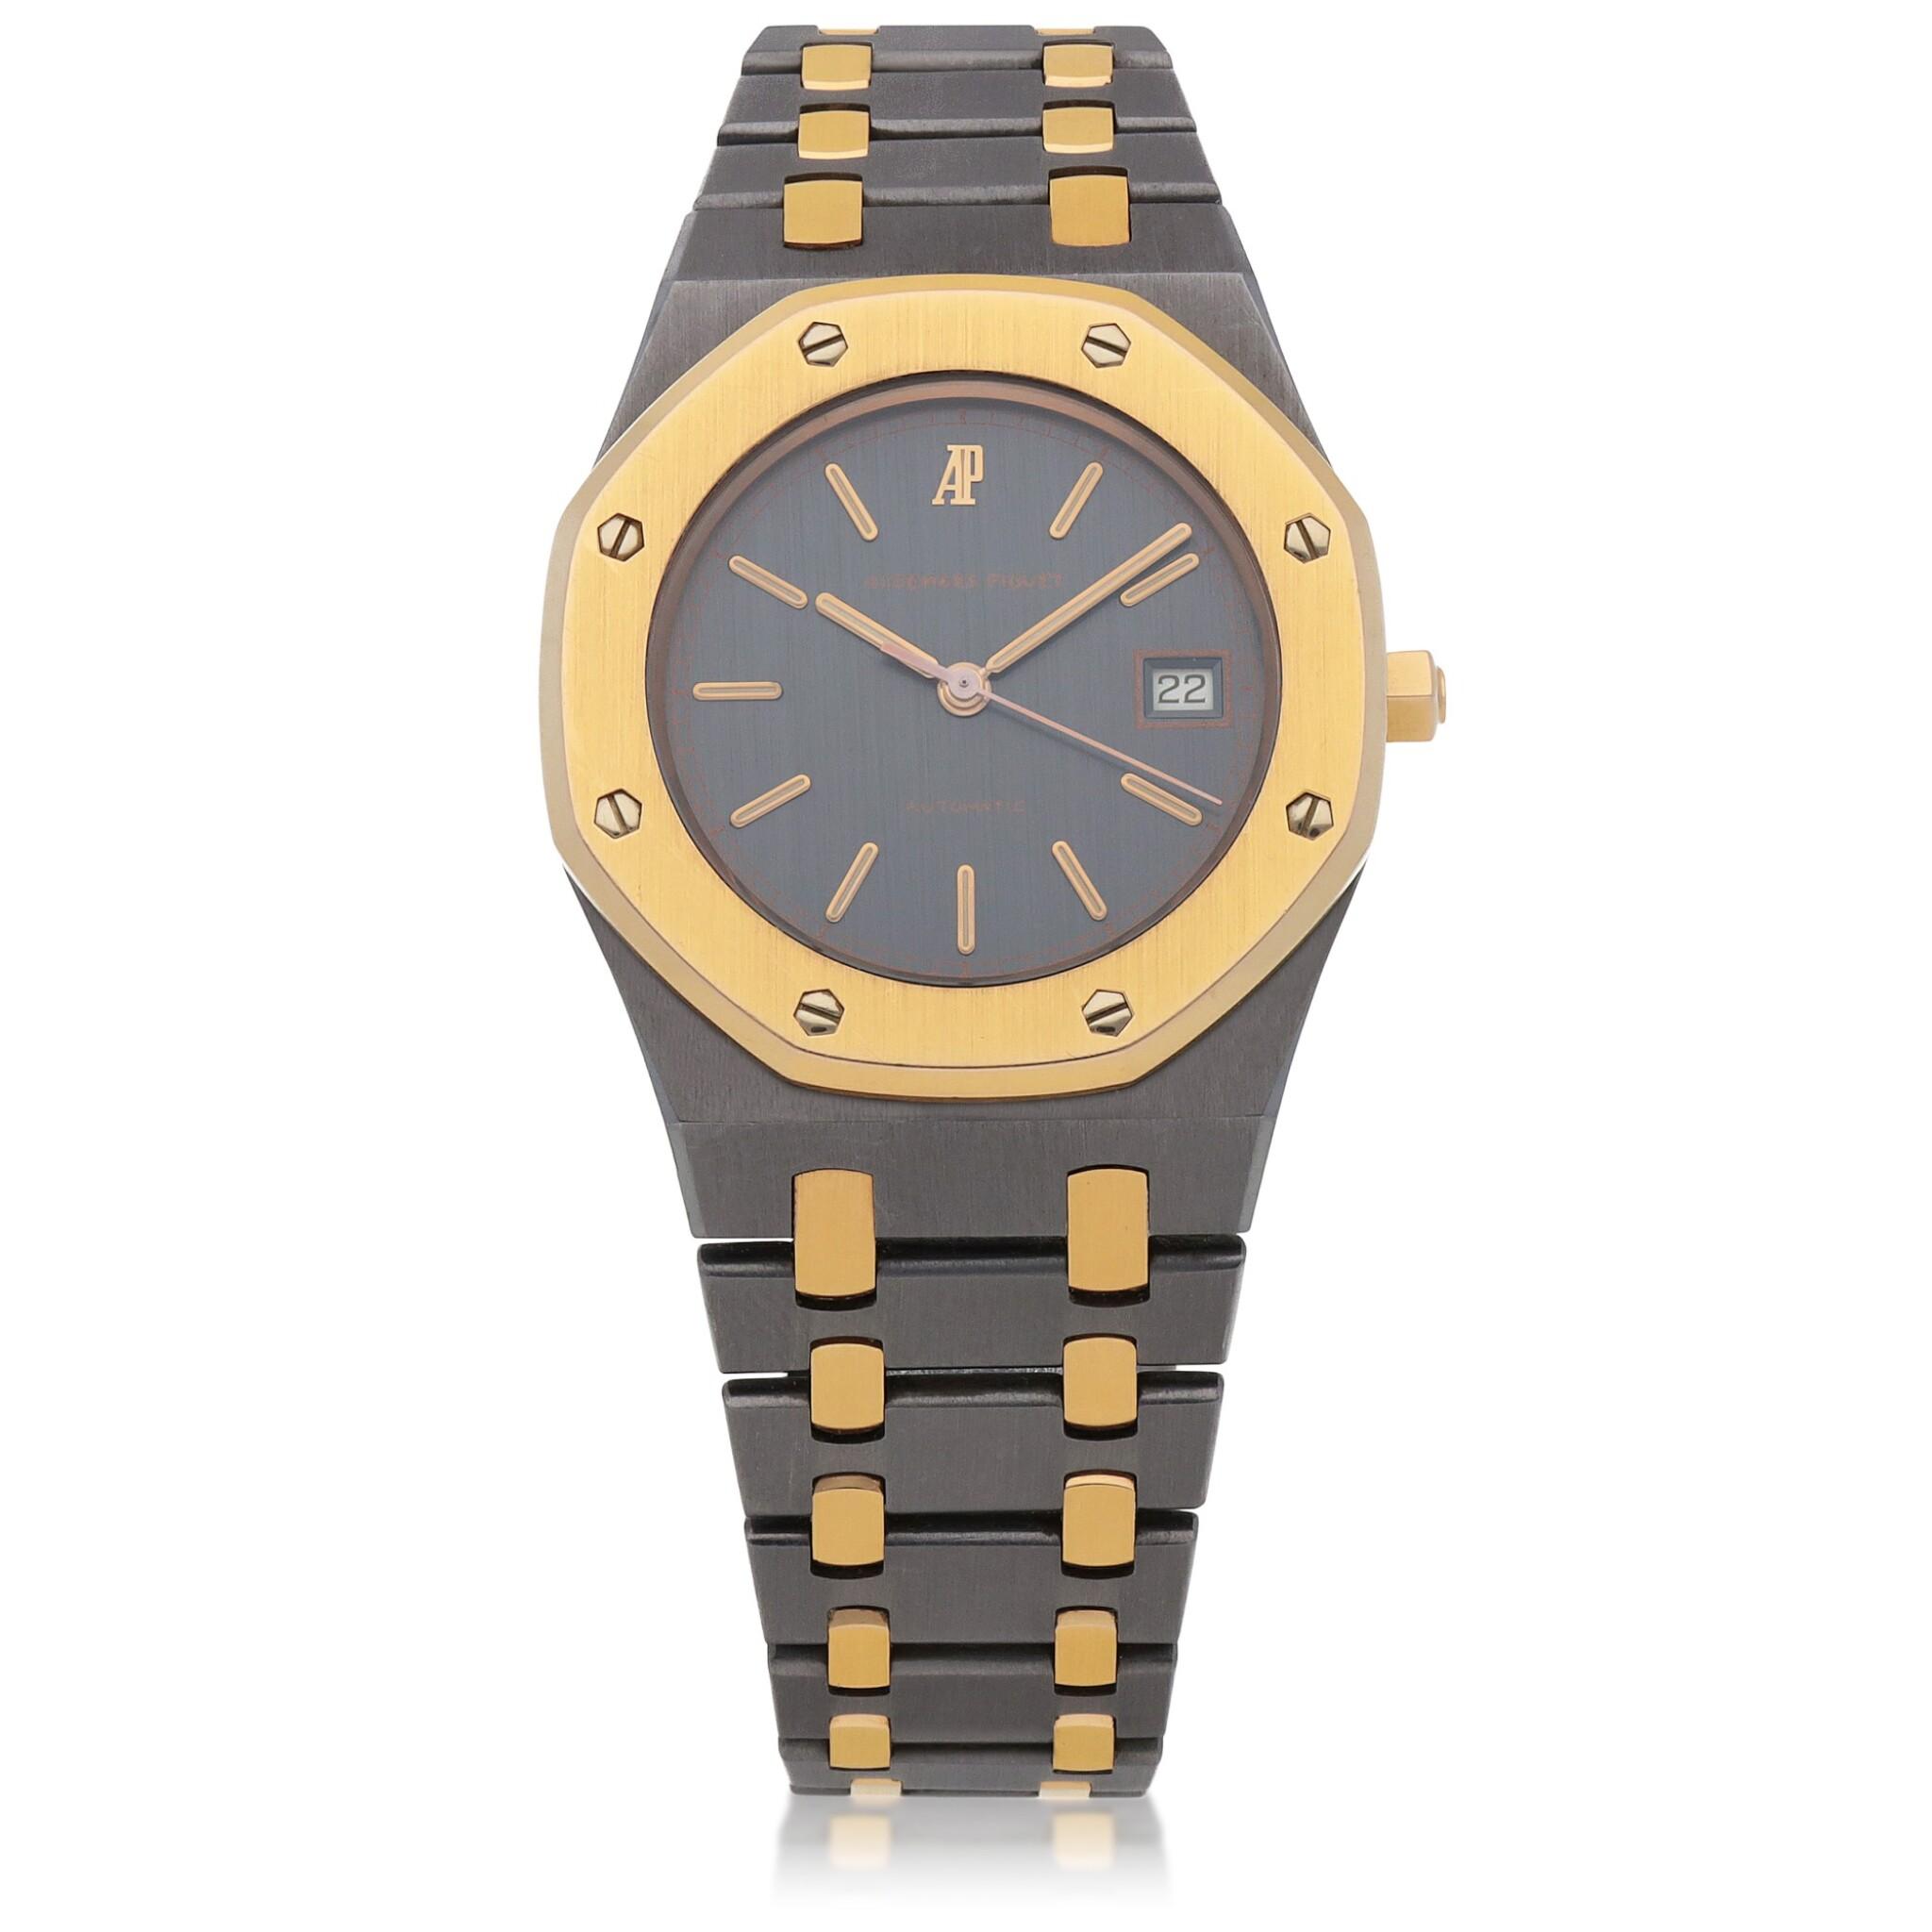 View full screen - View 1 of Lot 521. Royal Oak, Ref. 14486TR Pink gold and tantalum wristwatch with date and bracelet Circa 1993 | 愛彼 14486TR型號「Royal Oak」粉紅金及鉭金屬鍊帶腕錶備日期顯示,年份約1993.